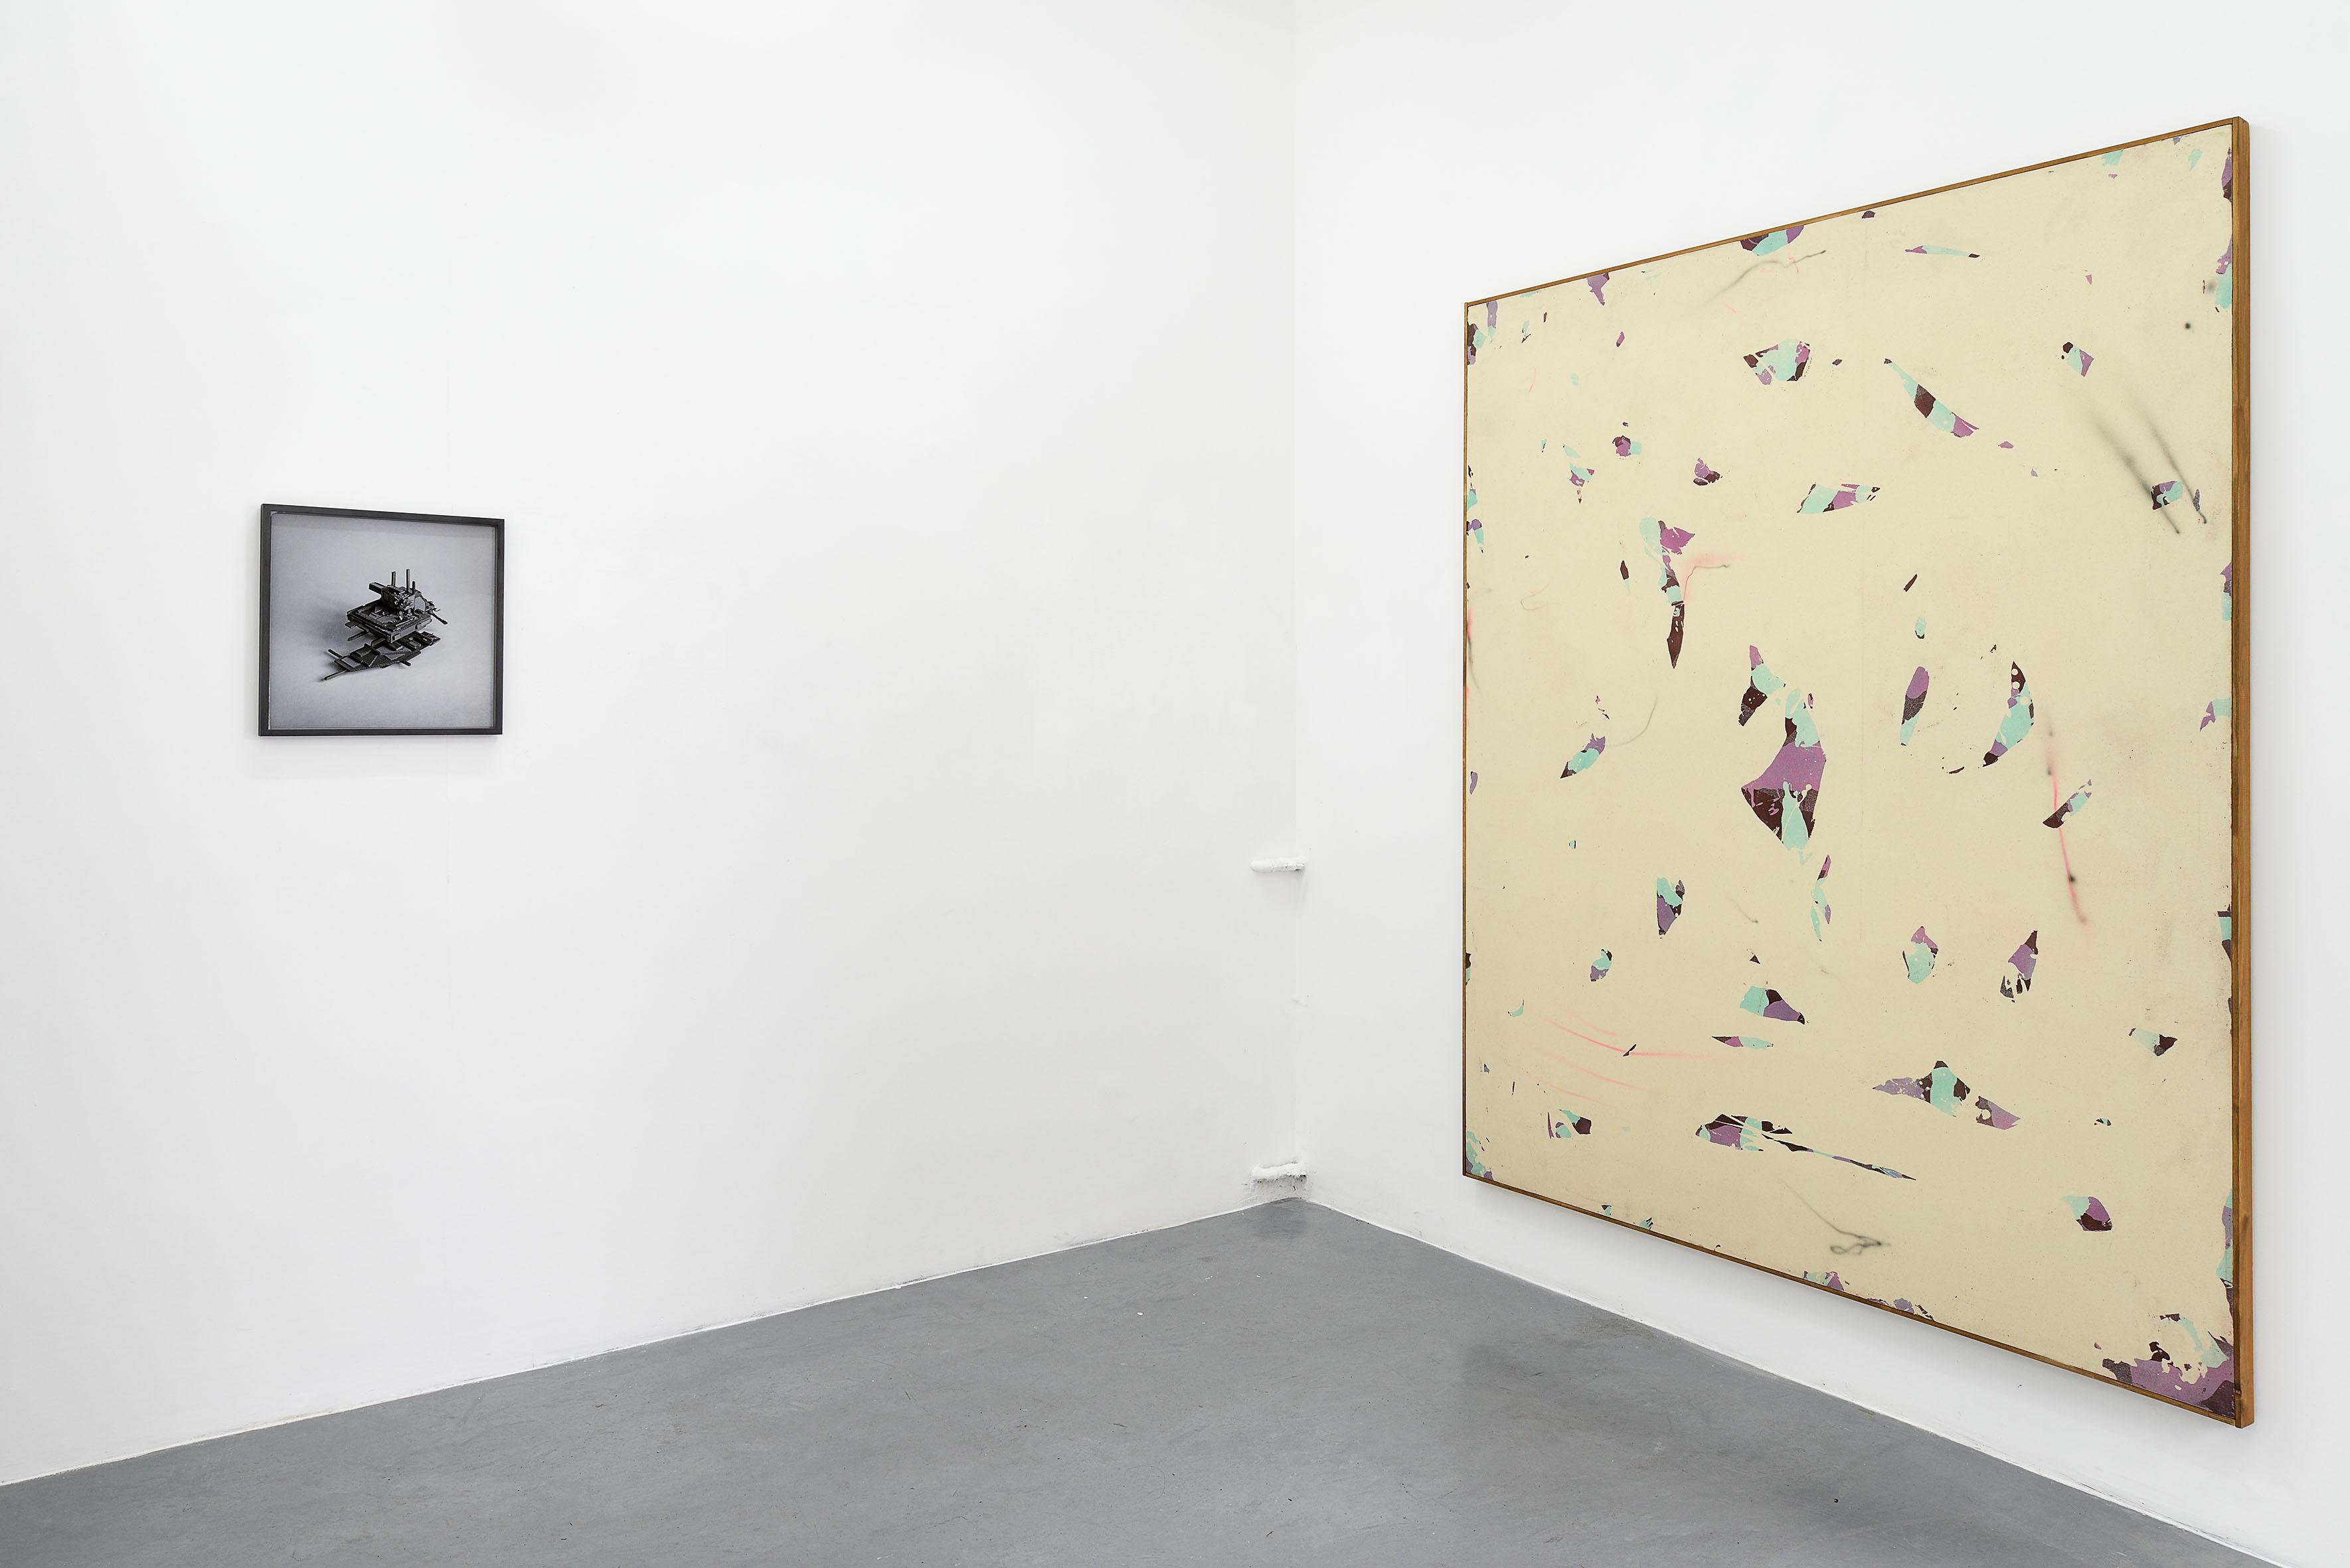 Anatomy of Restlessness – installation view at Galleria Mario Iannelli, Roma 2016 - photo Alberto Apa - courtesy Galleria Mario Iannelli